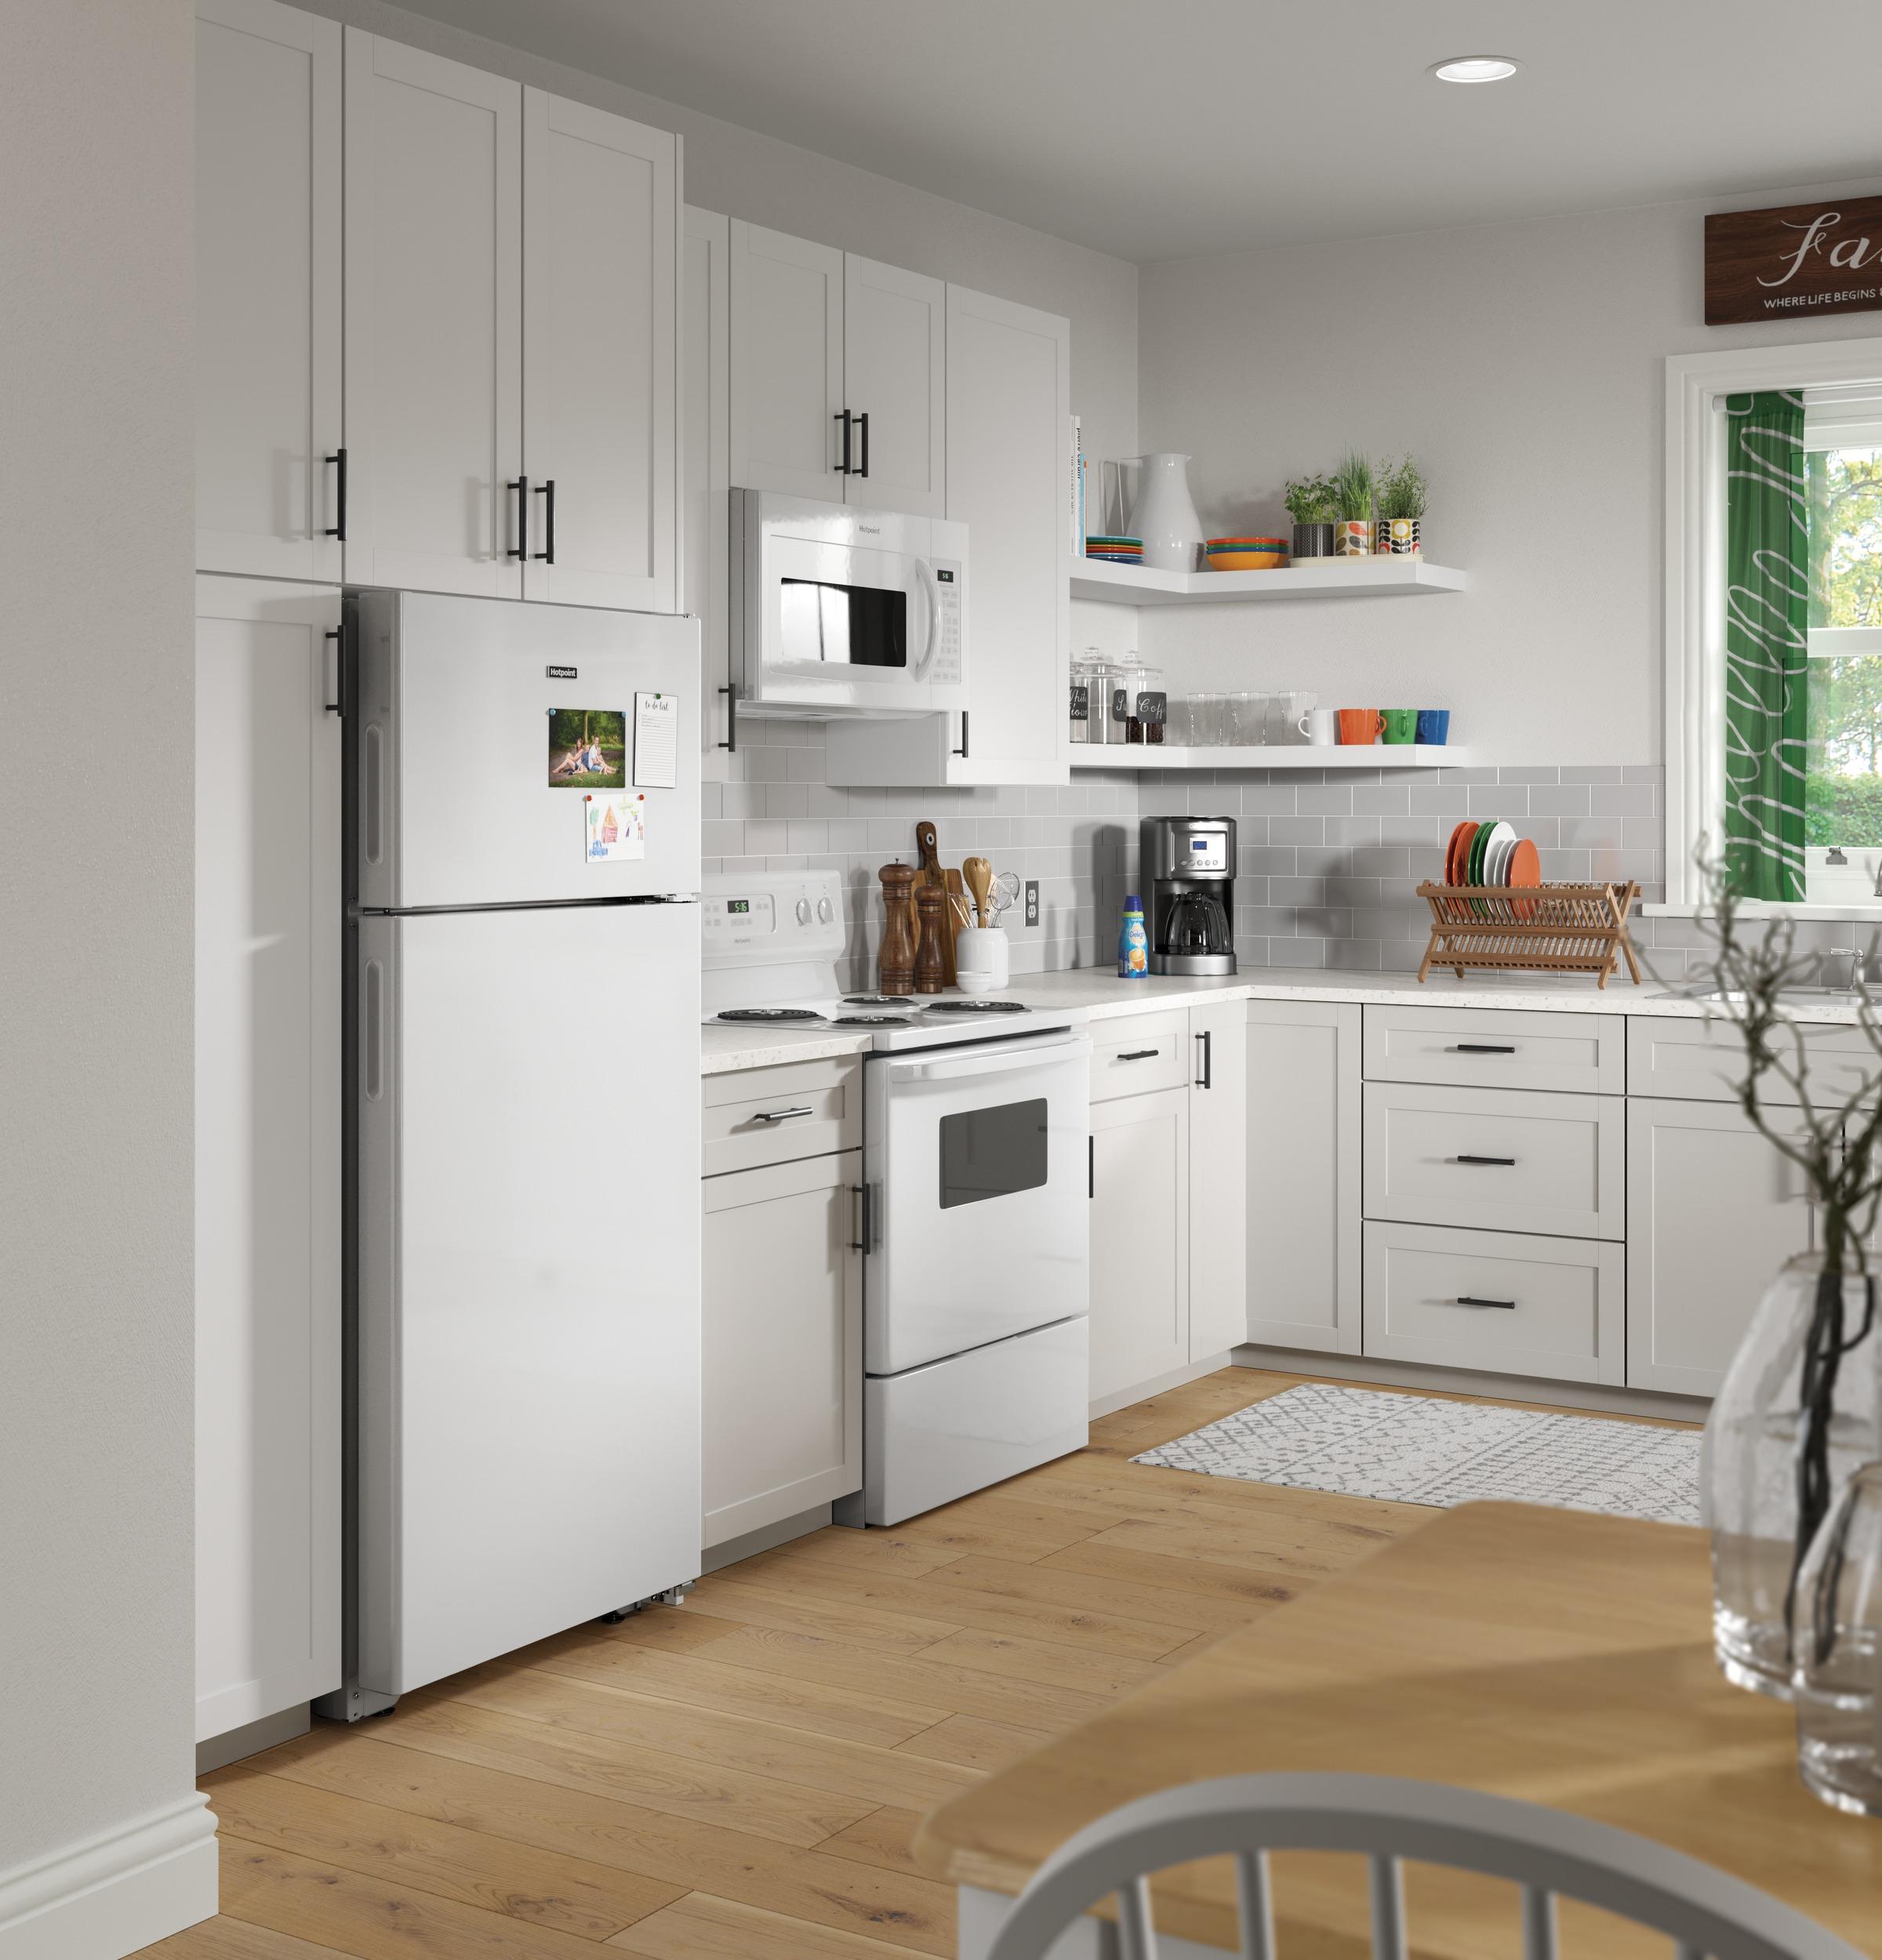 Model: HPS18BTHWW   Hotpoint Hotpoint® 17.5 Cu. Ft. Top-Freezer Refrigerator